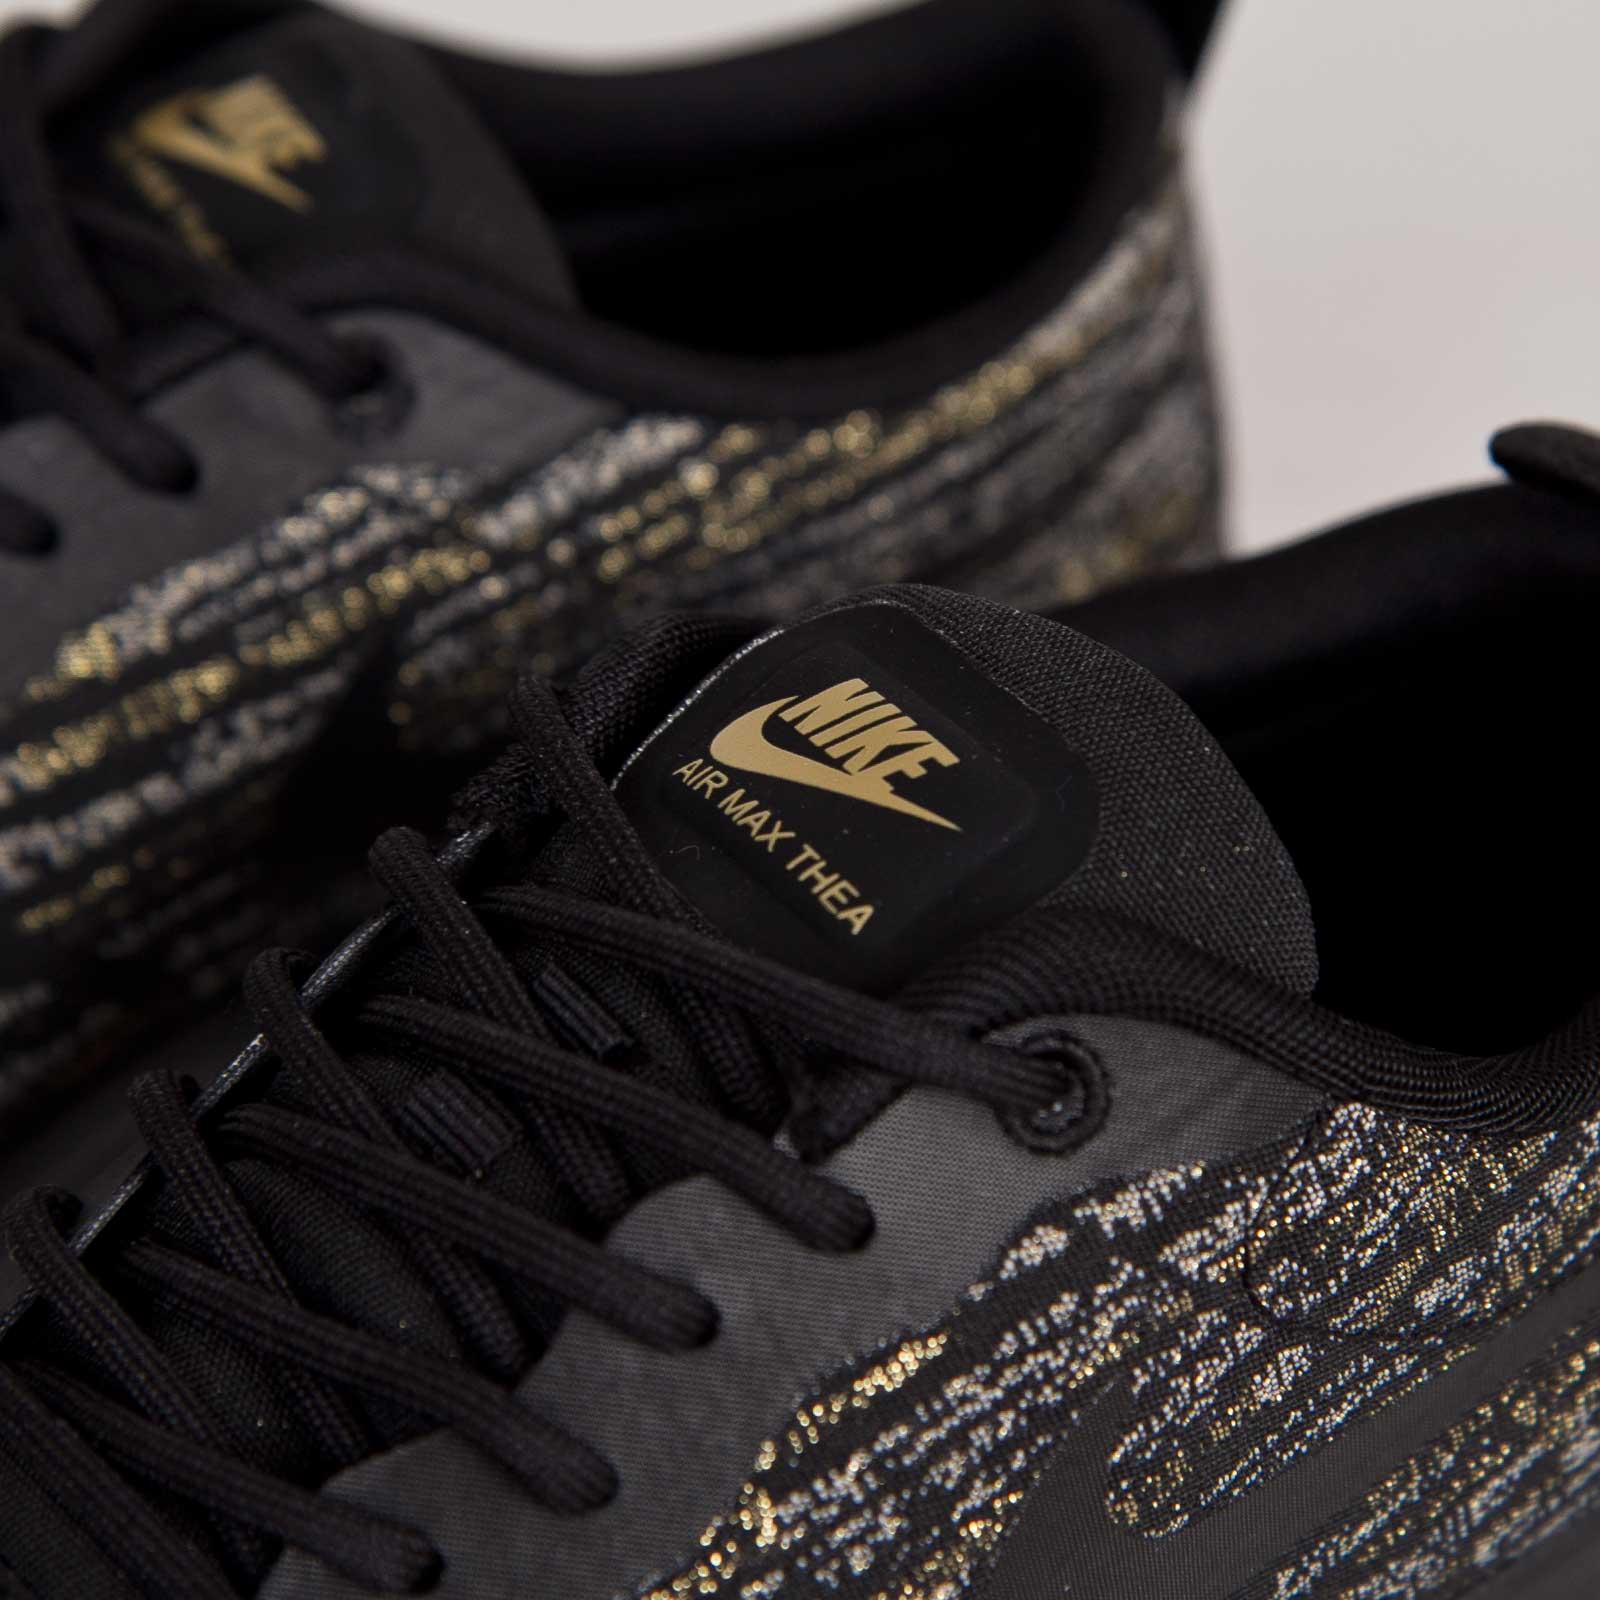 sale retailer bbbbf 5d4ec Nike Wmns Nike Air Max Thea Jacquard - 654170-002 - Sneakersnstuff |  sneakers & streetwear online since 1999